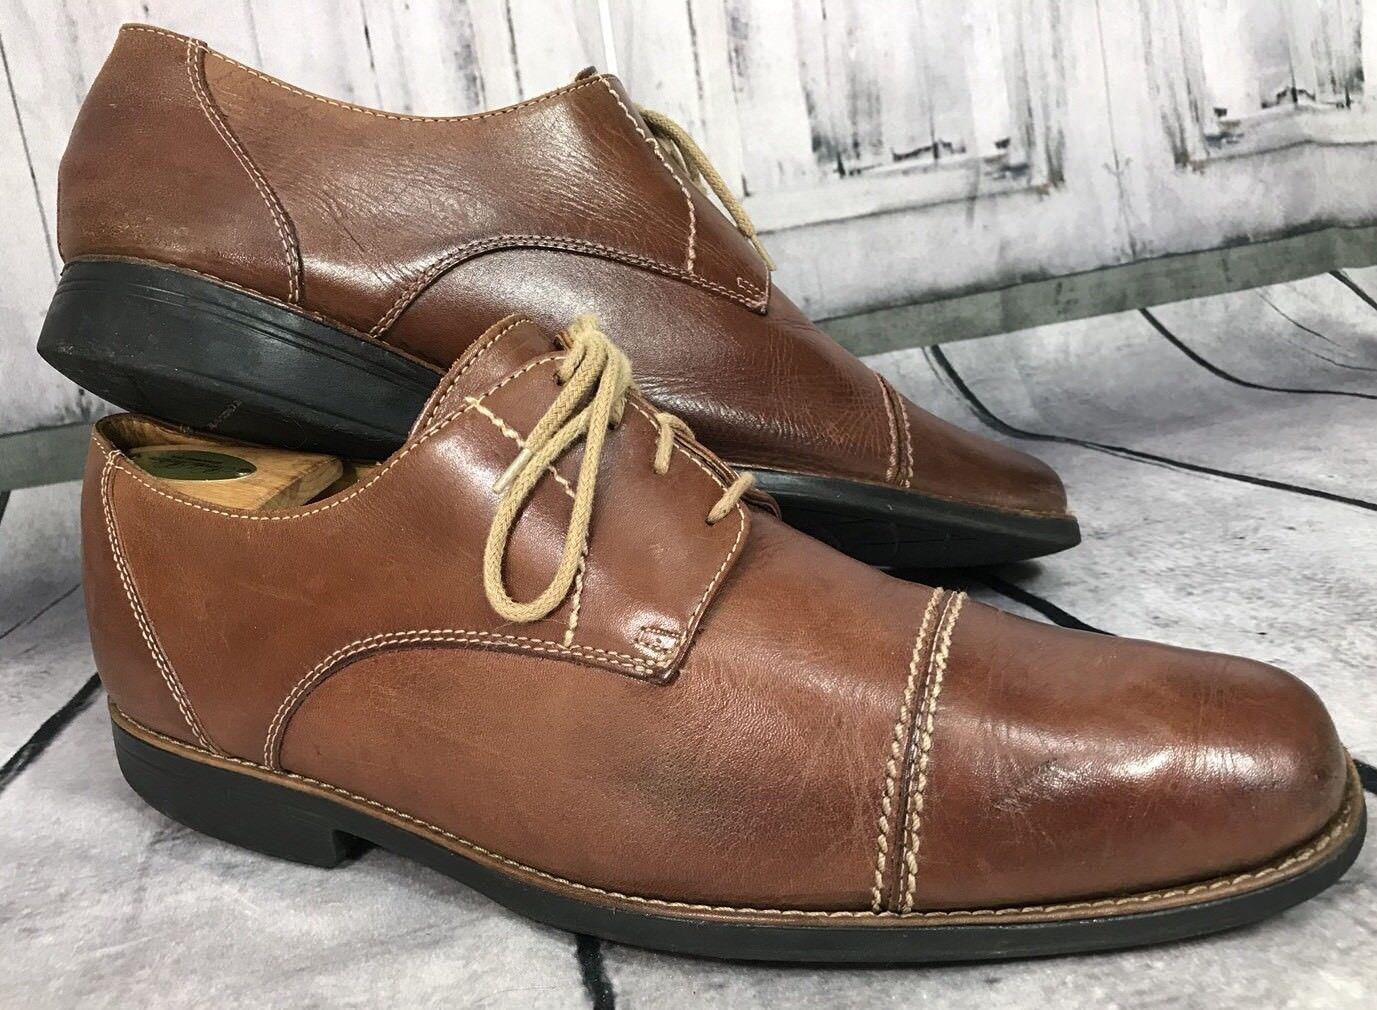 wholesape economico Norridge scarpe Uomo Moscolini Sandro